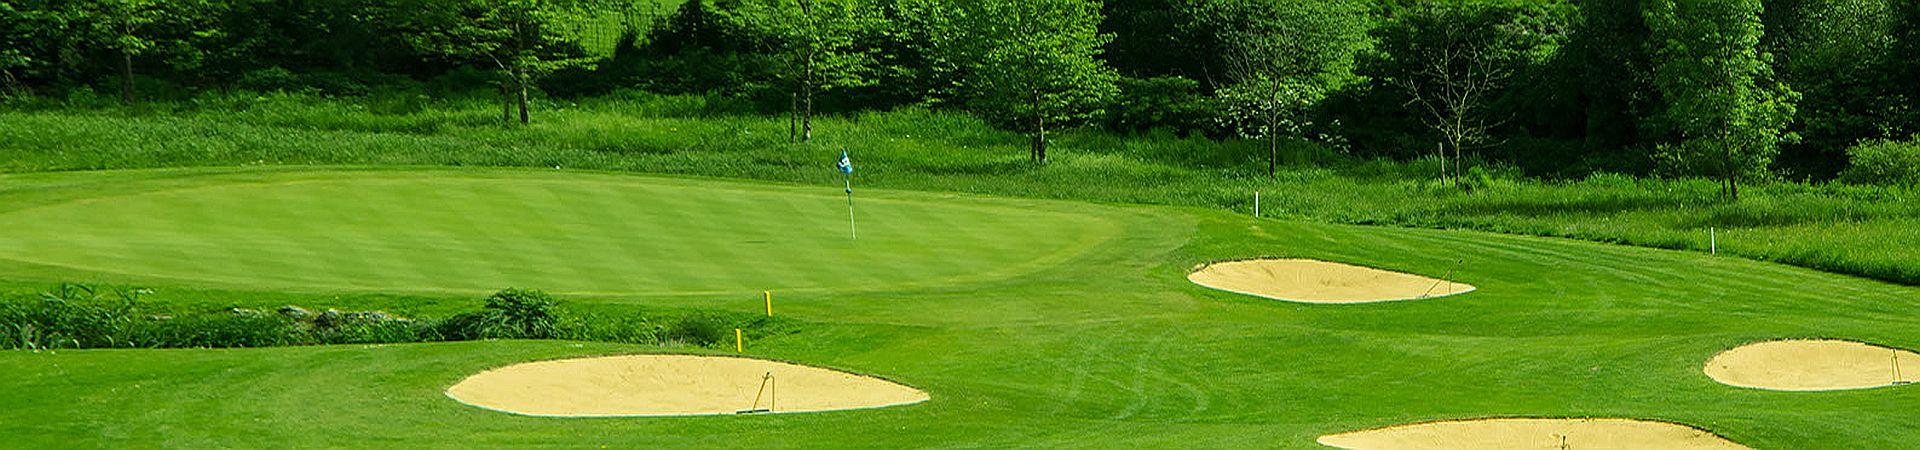 Golfplatz Salzburg Head